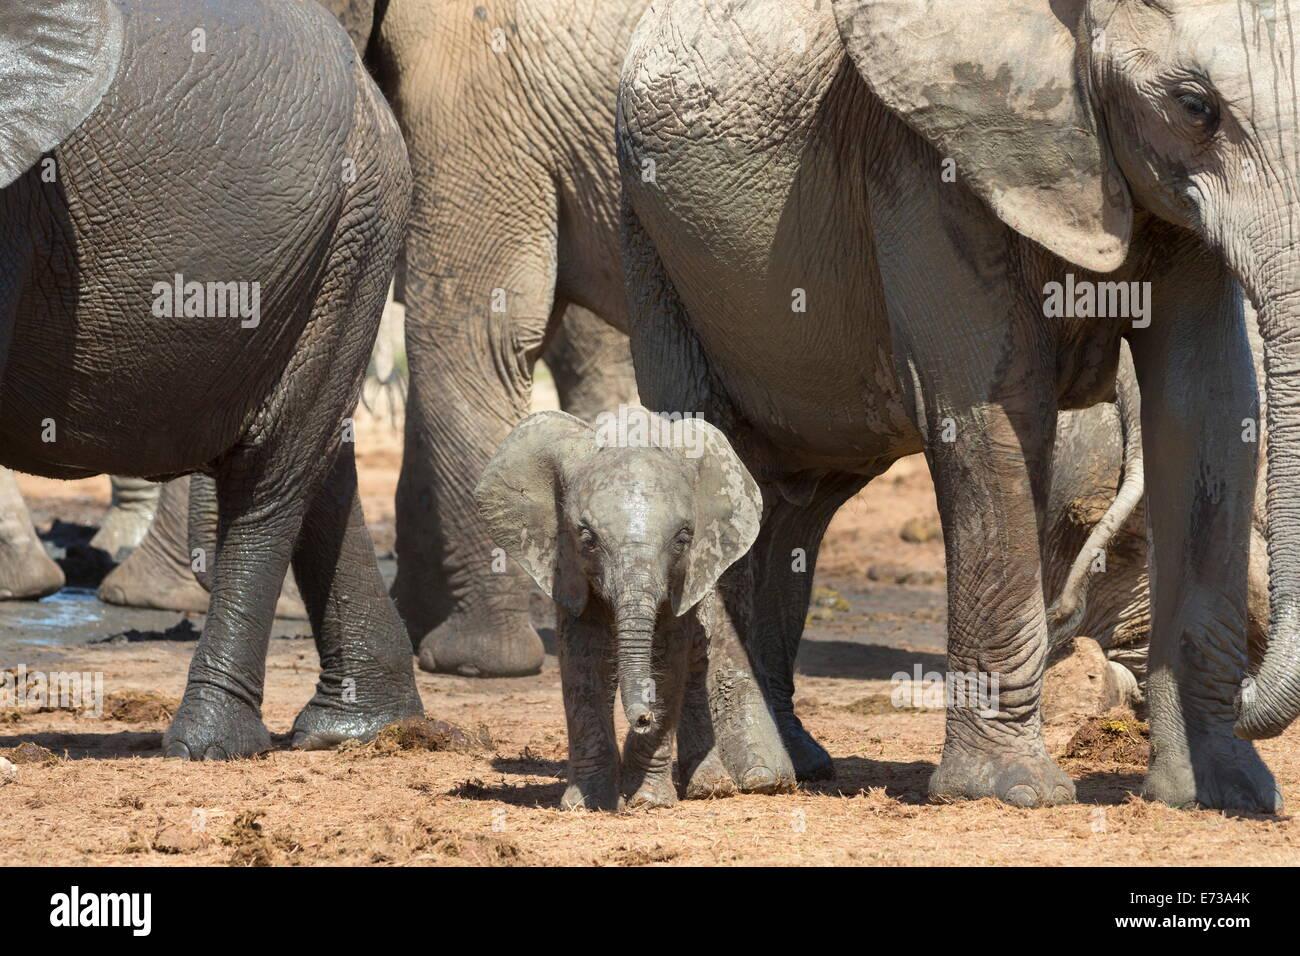 Afrikanische Elefantenbaby mit Herde am Hapoor Wasserloch, Addo Elephant National Park, Eastern Cape, Südafrika Stockfoto